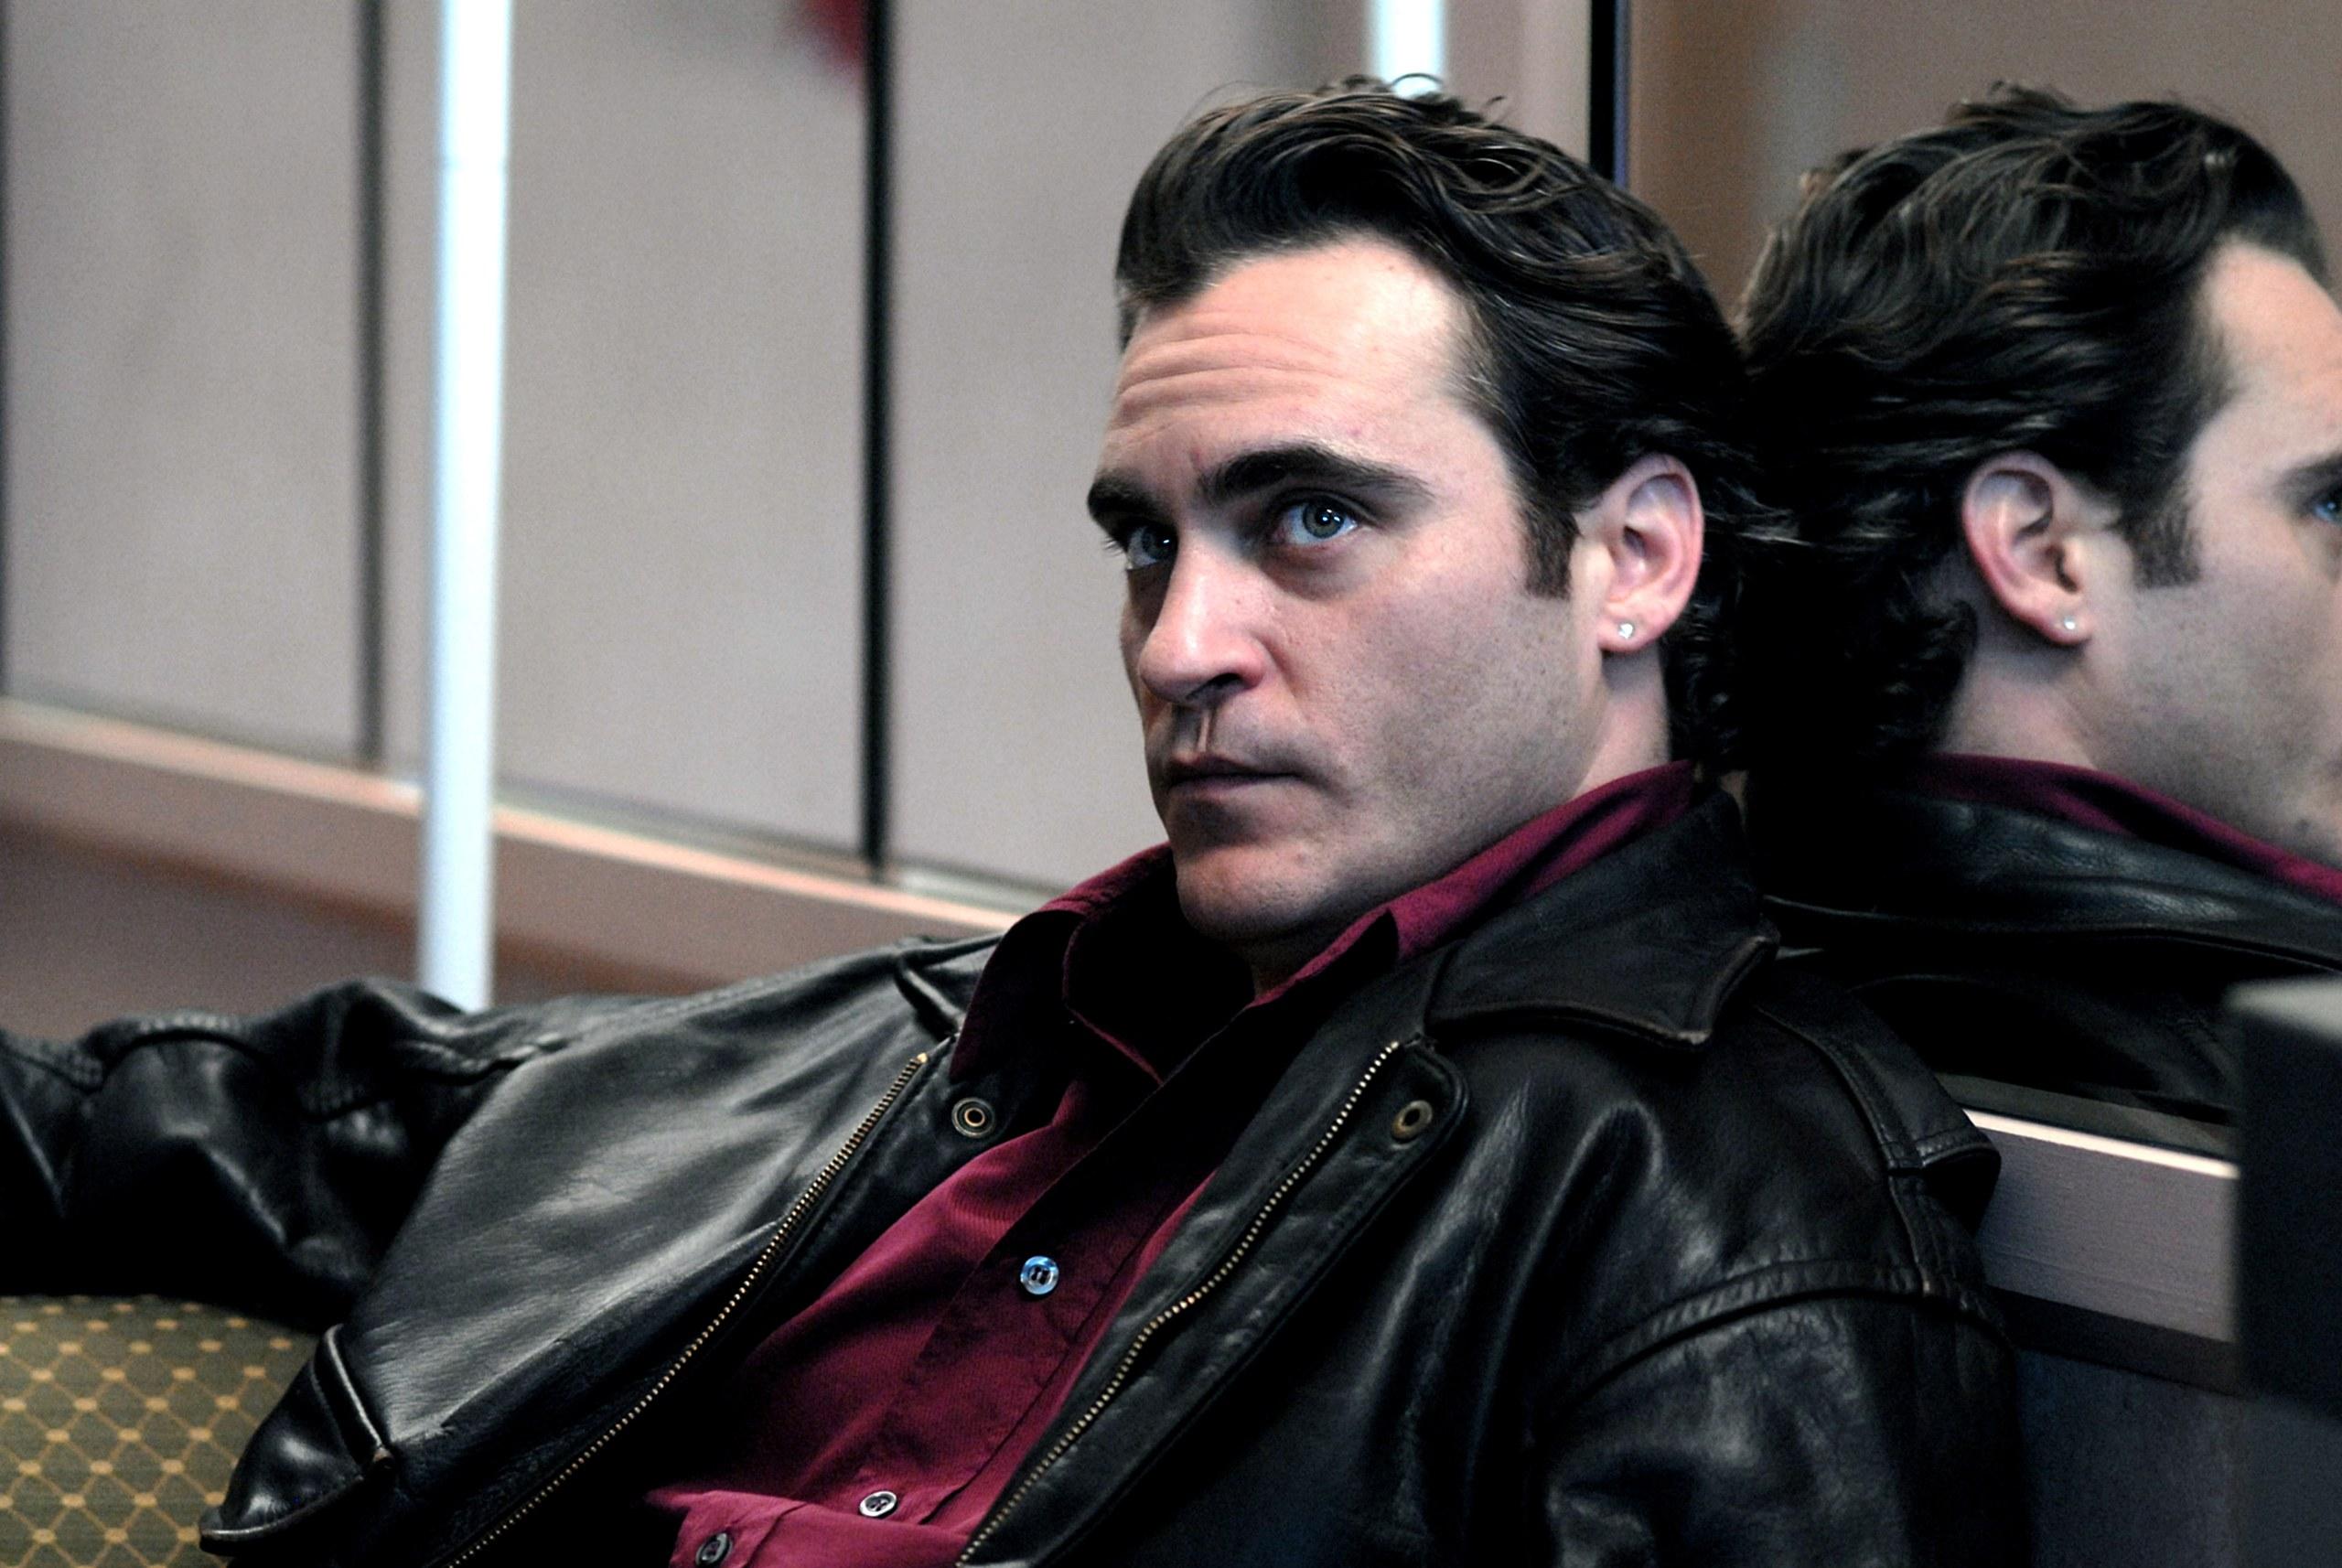 Хоакин Феникс (Joaquin Phoenix), биография